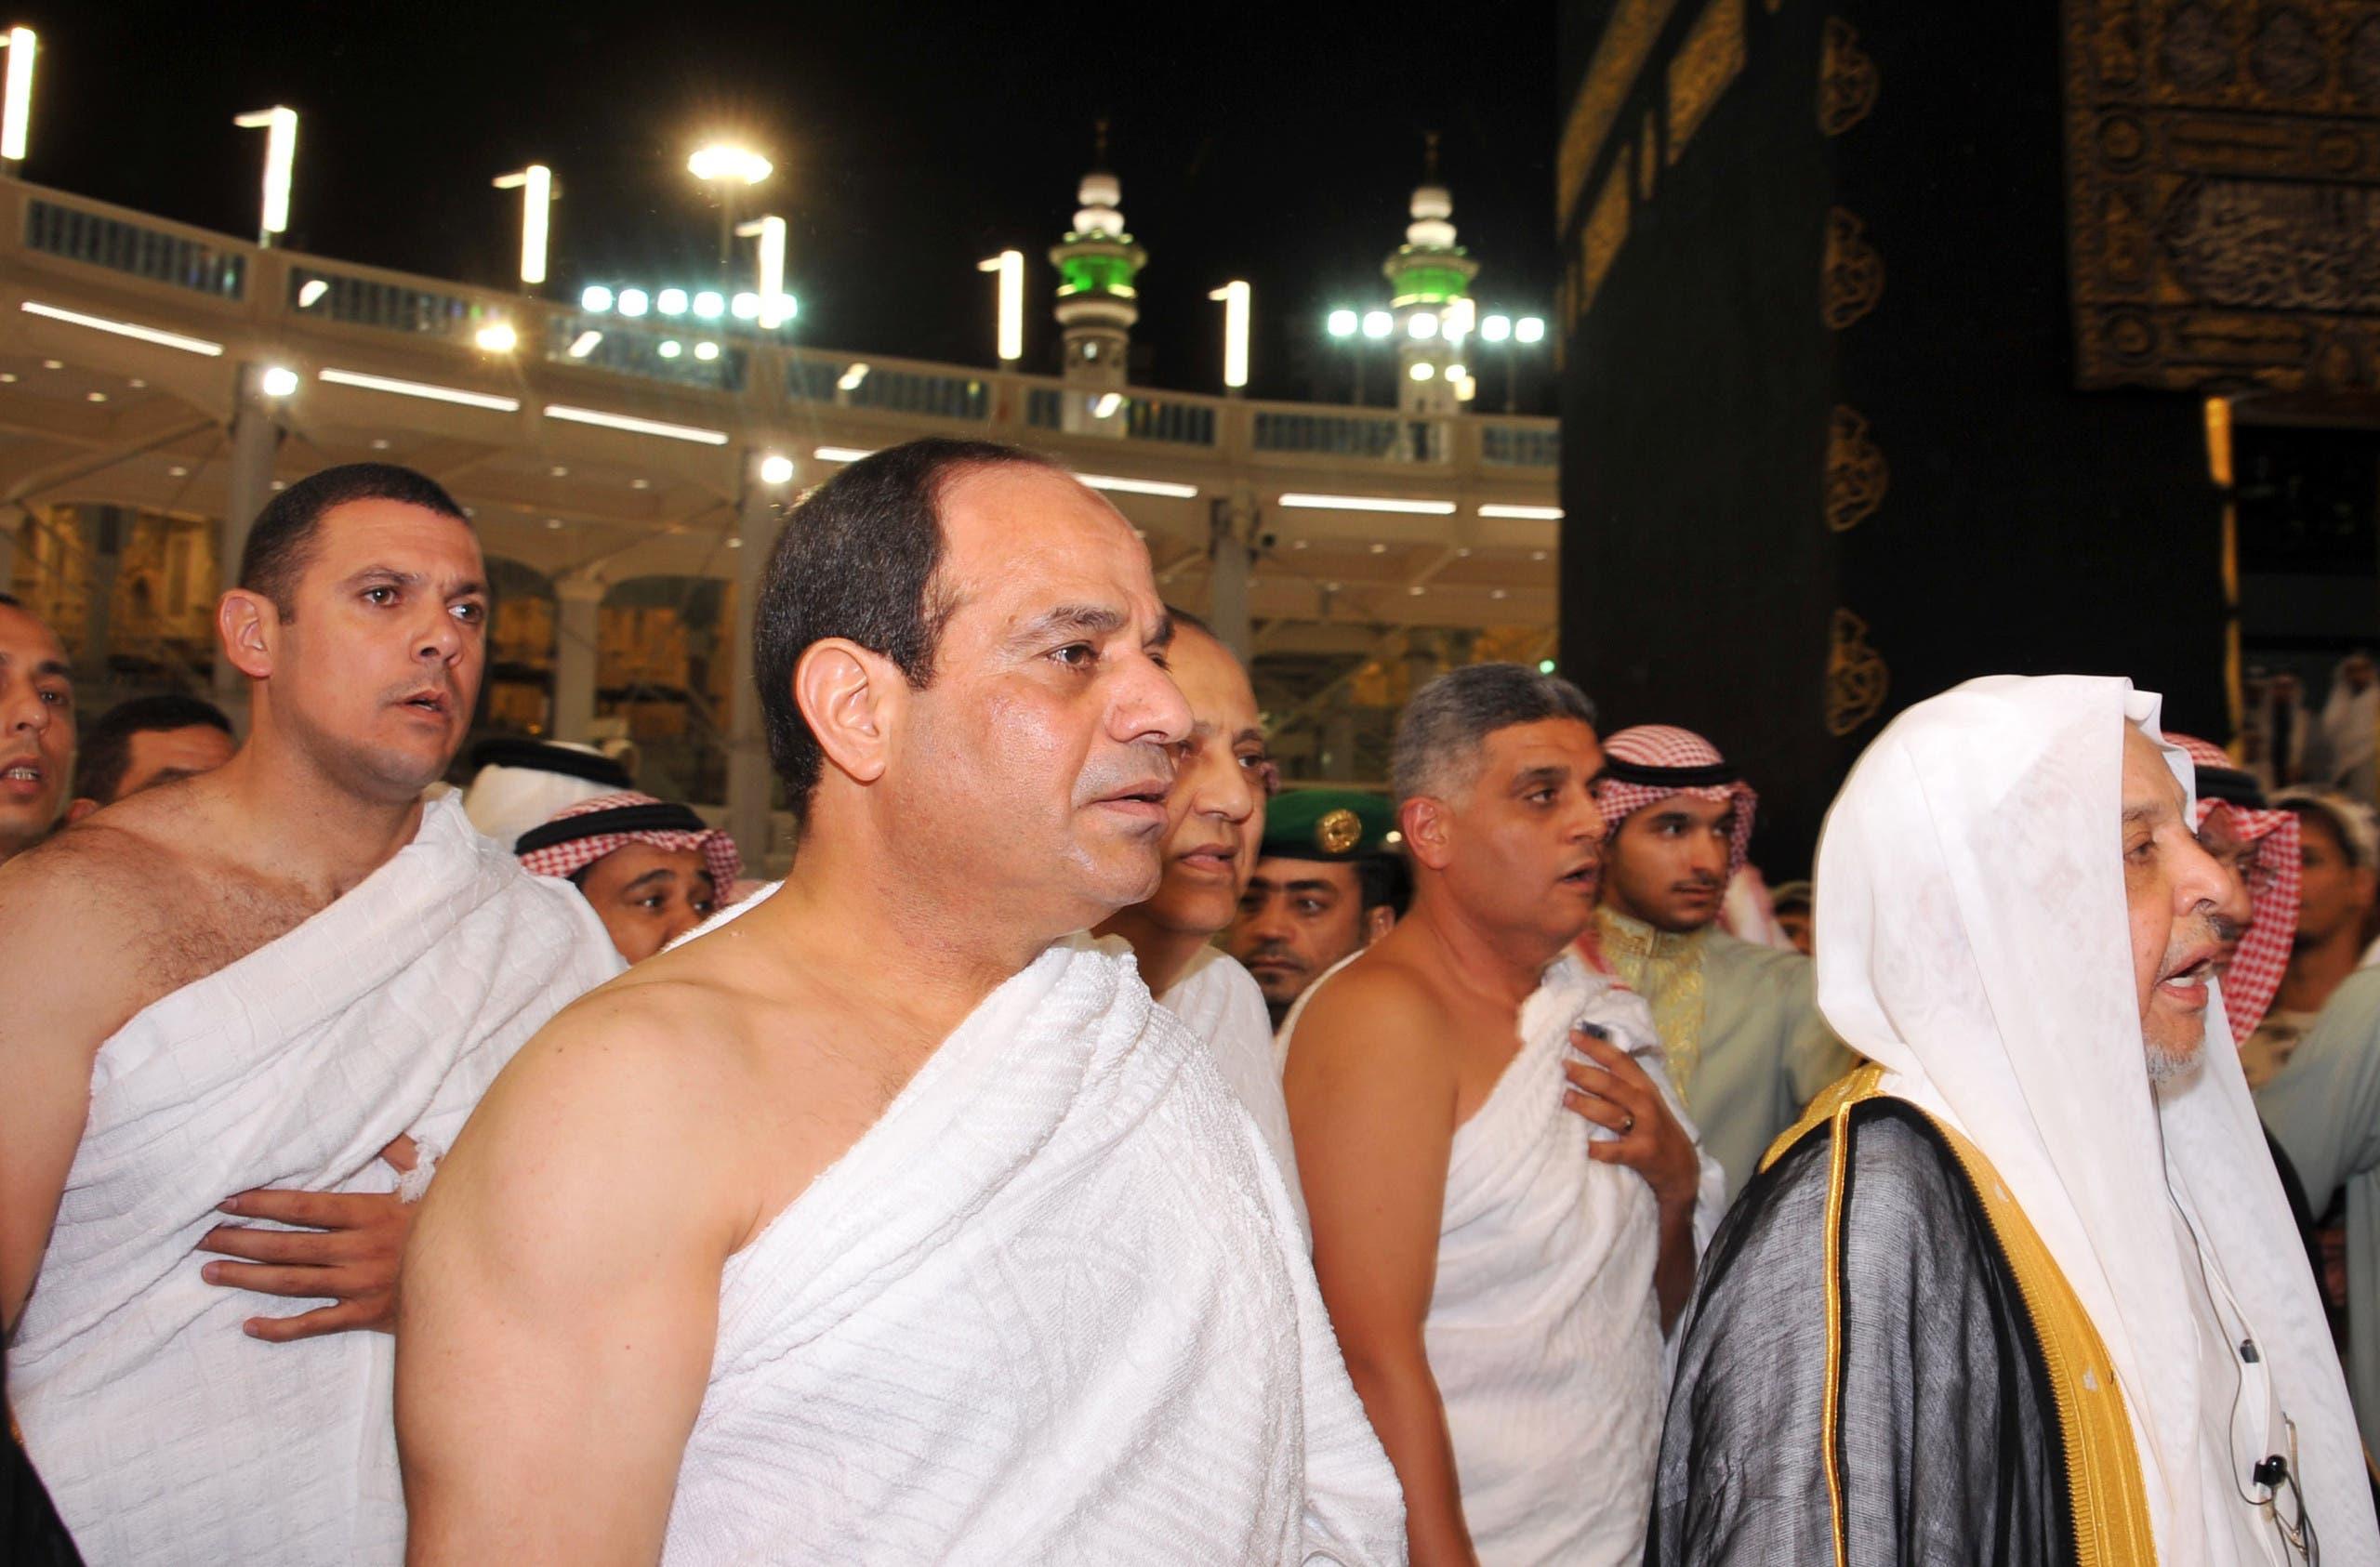 Arab egypt 23 - 1 10